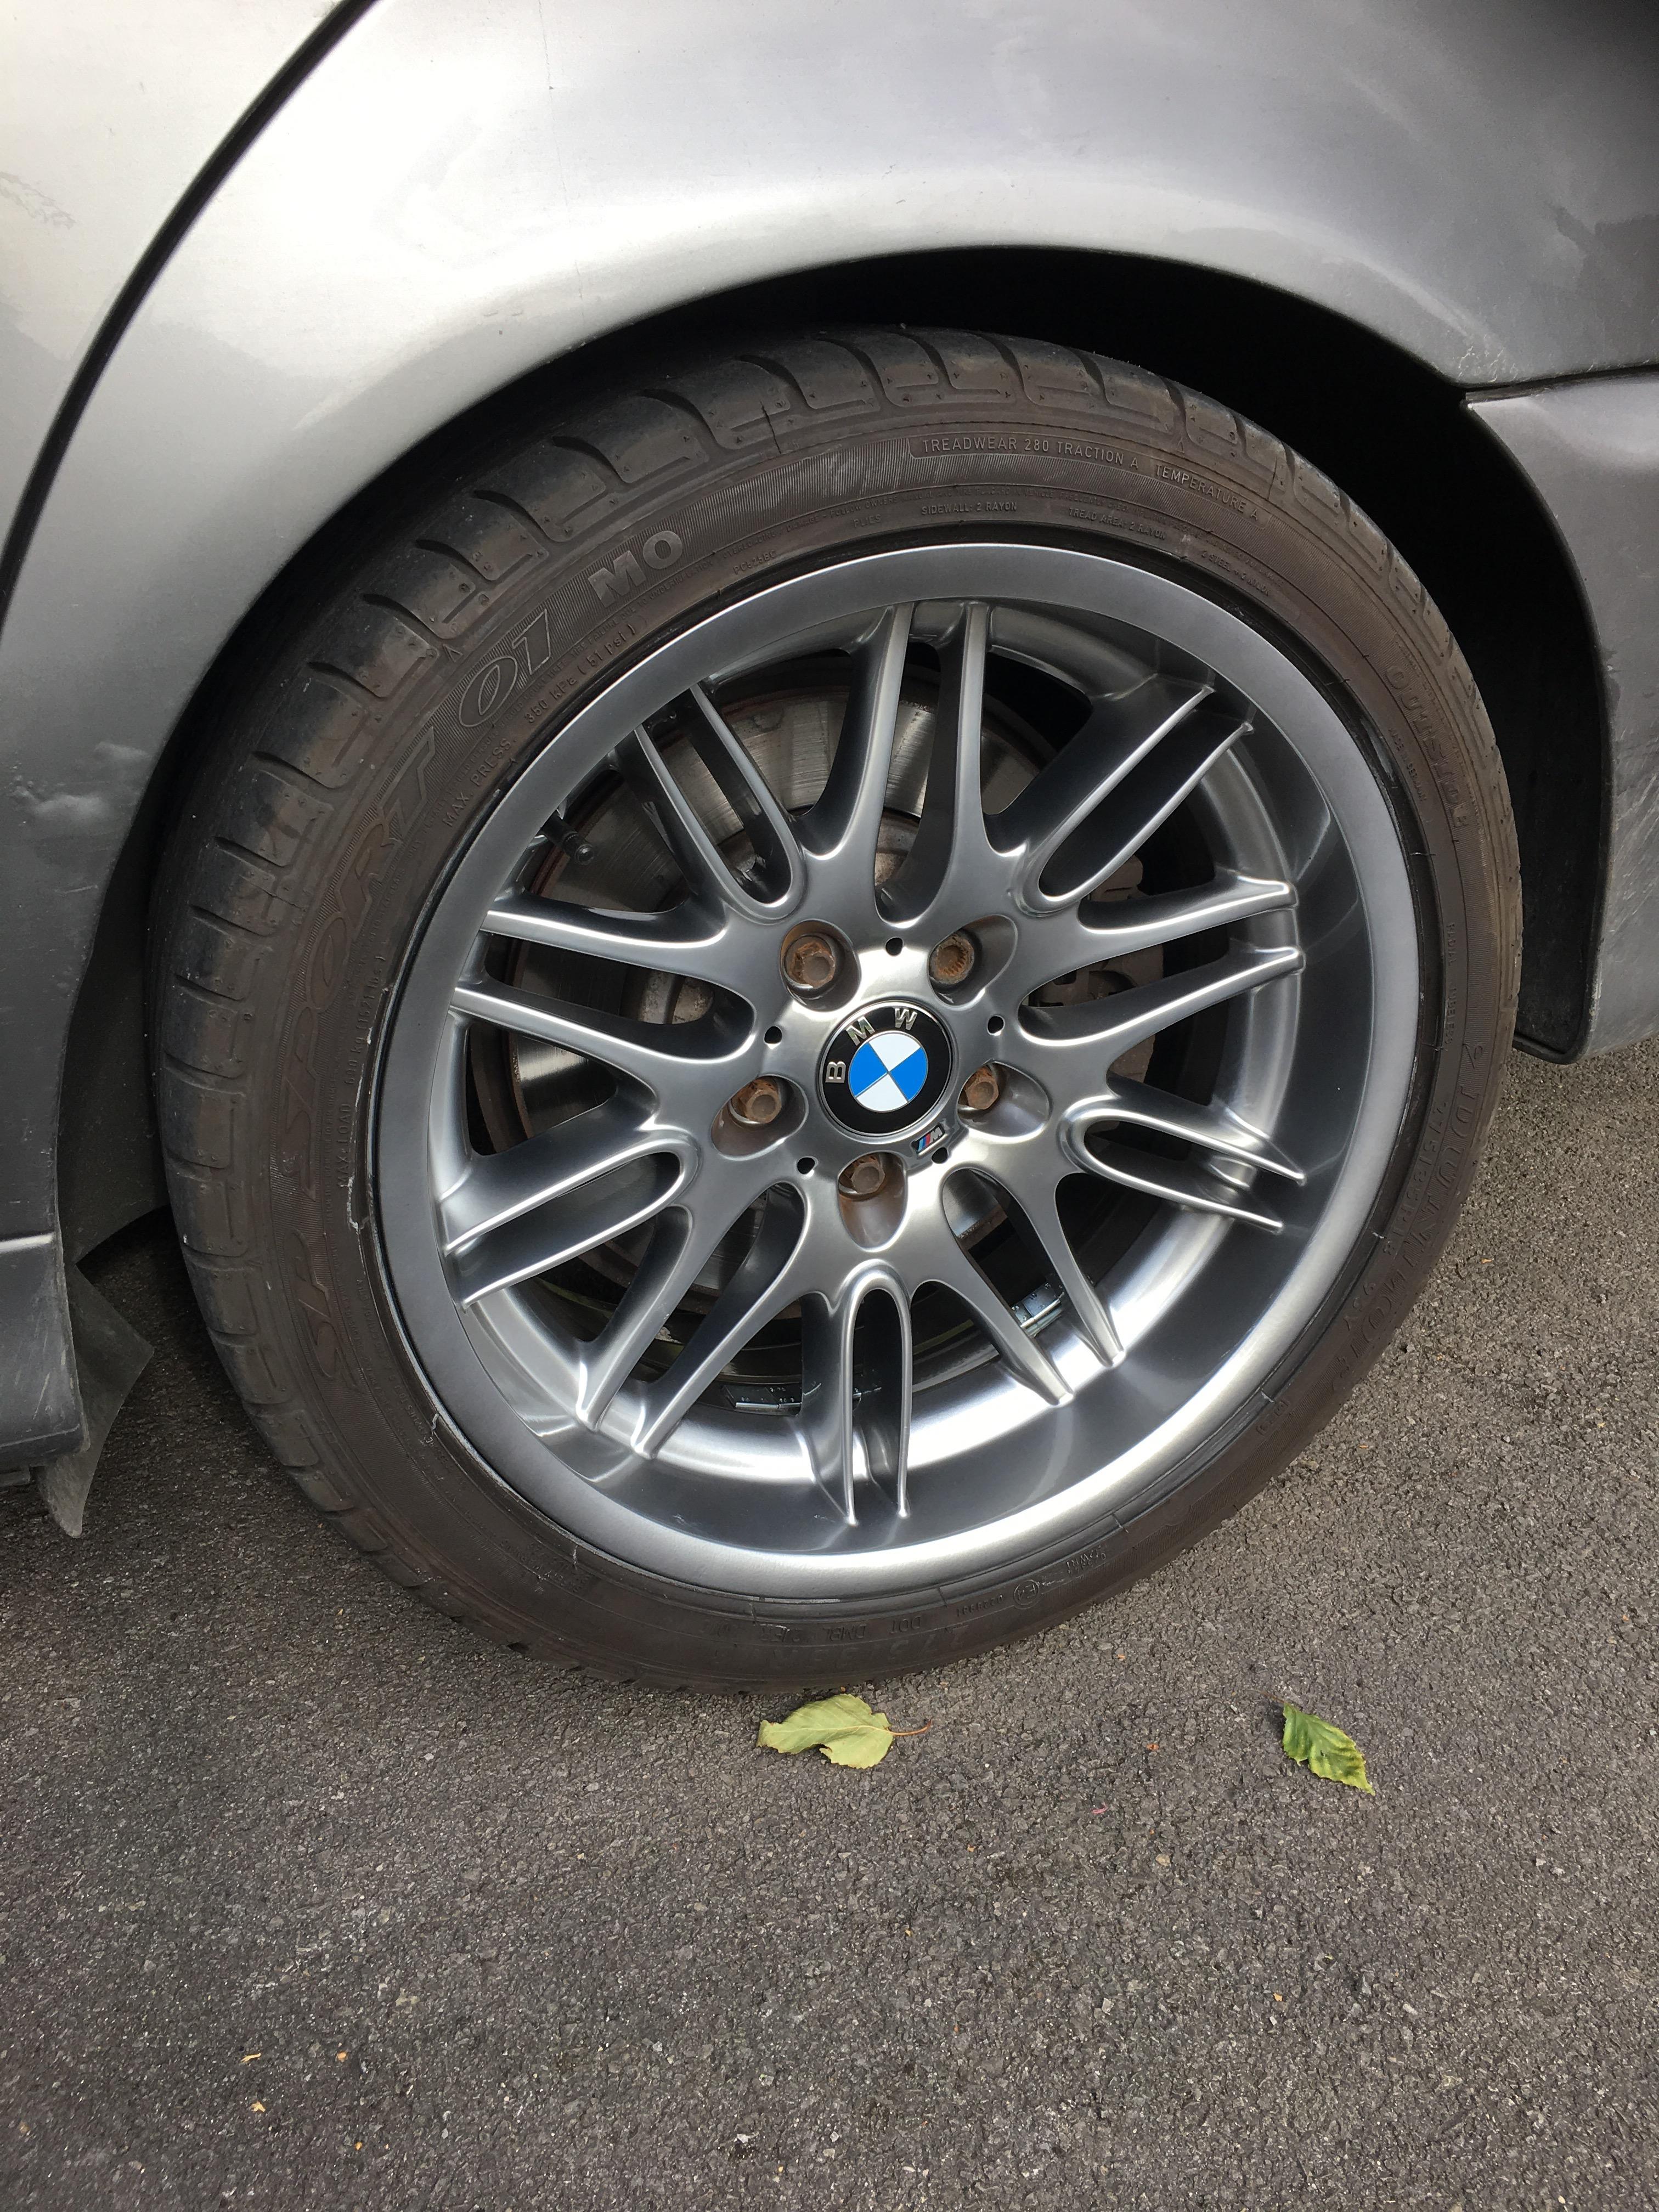 Shadow Chrome Wheel Restoration Uk Bmw M5 Forum And M6 Forums